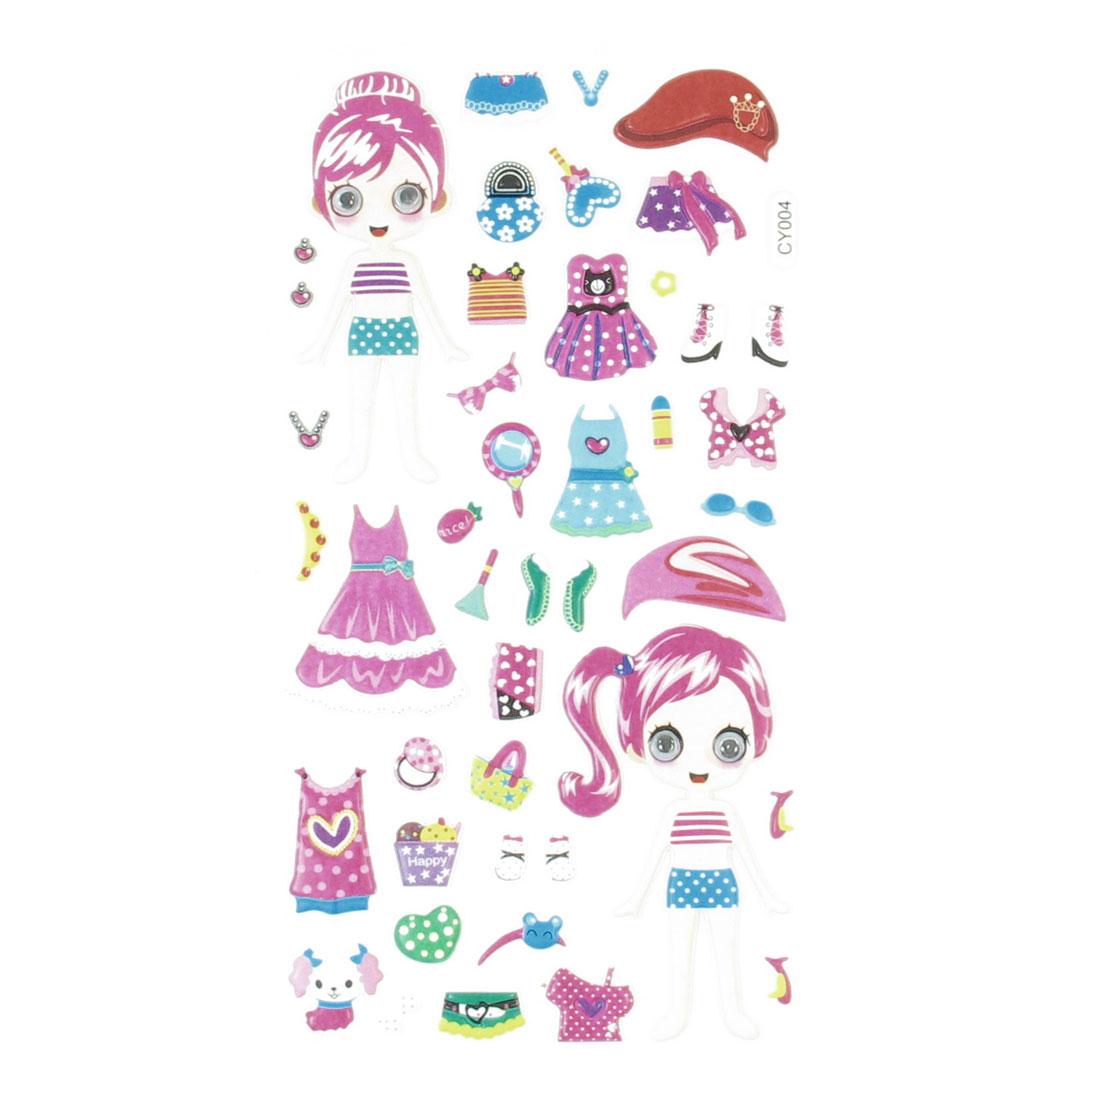 Wobble Eyes Girl Dolls Dress Up Skirt Pattern Crafts DIY Sponge Sticker